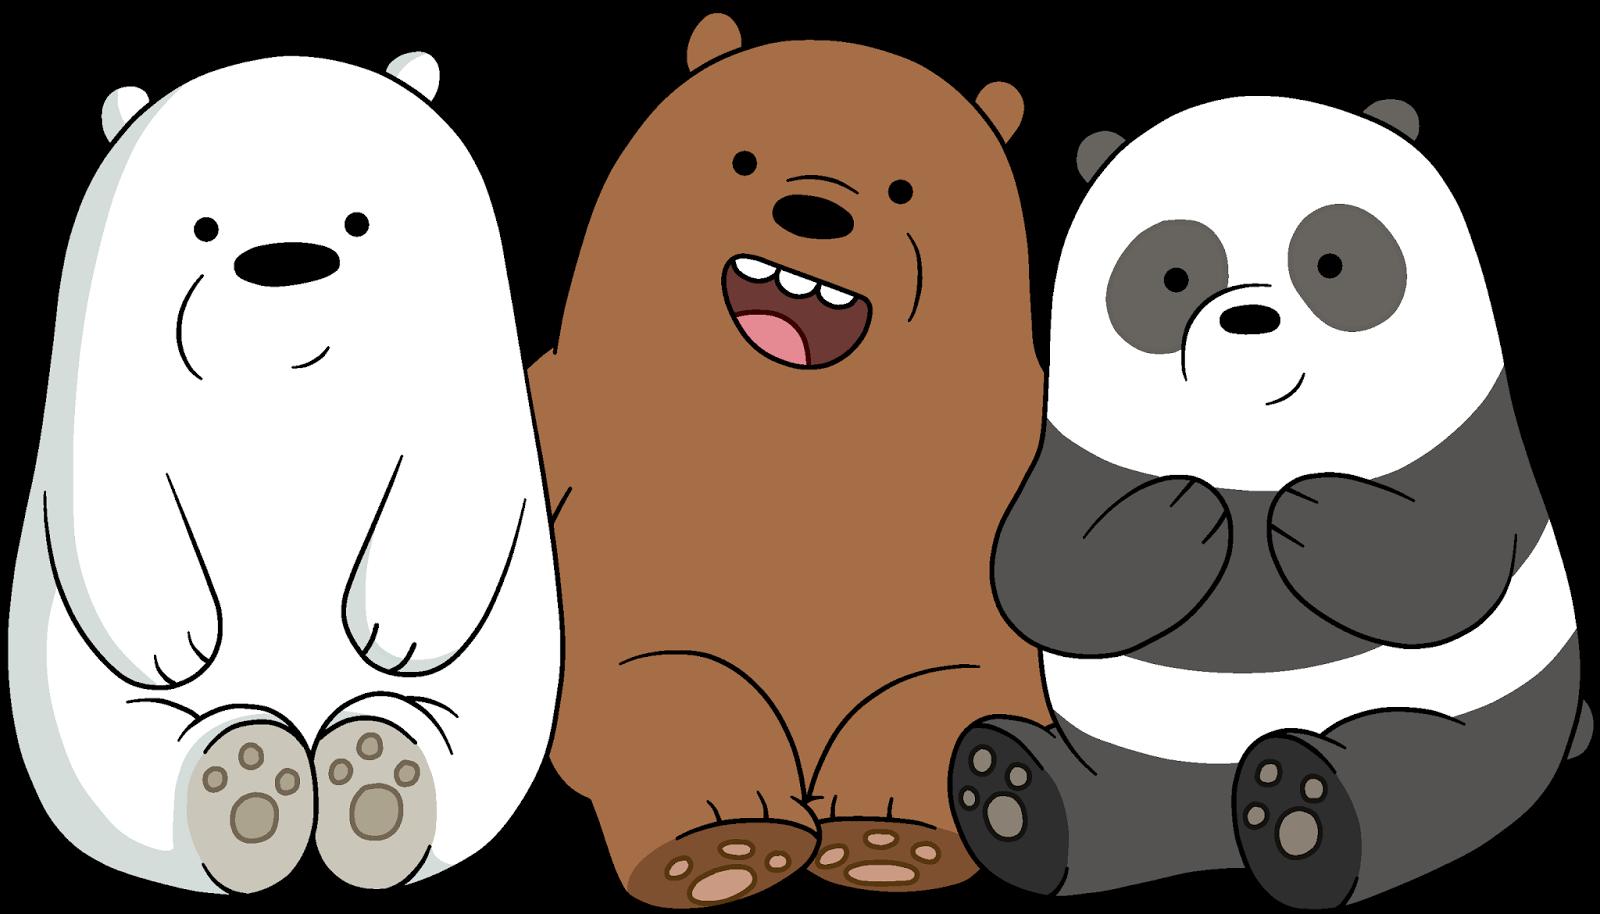 Awkward we bare bears. Clipart bear beruang